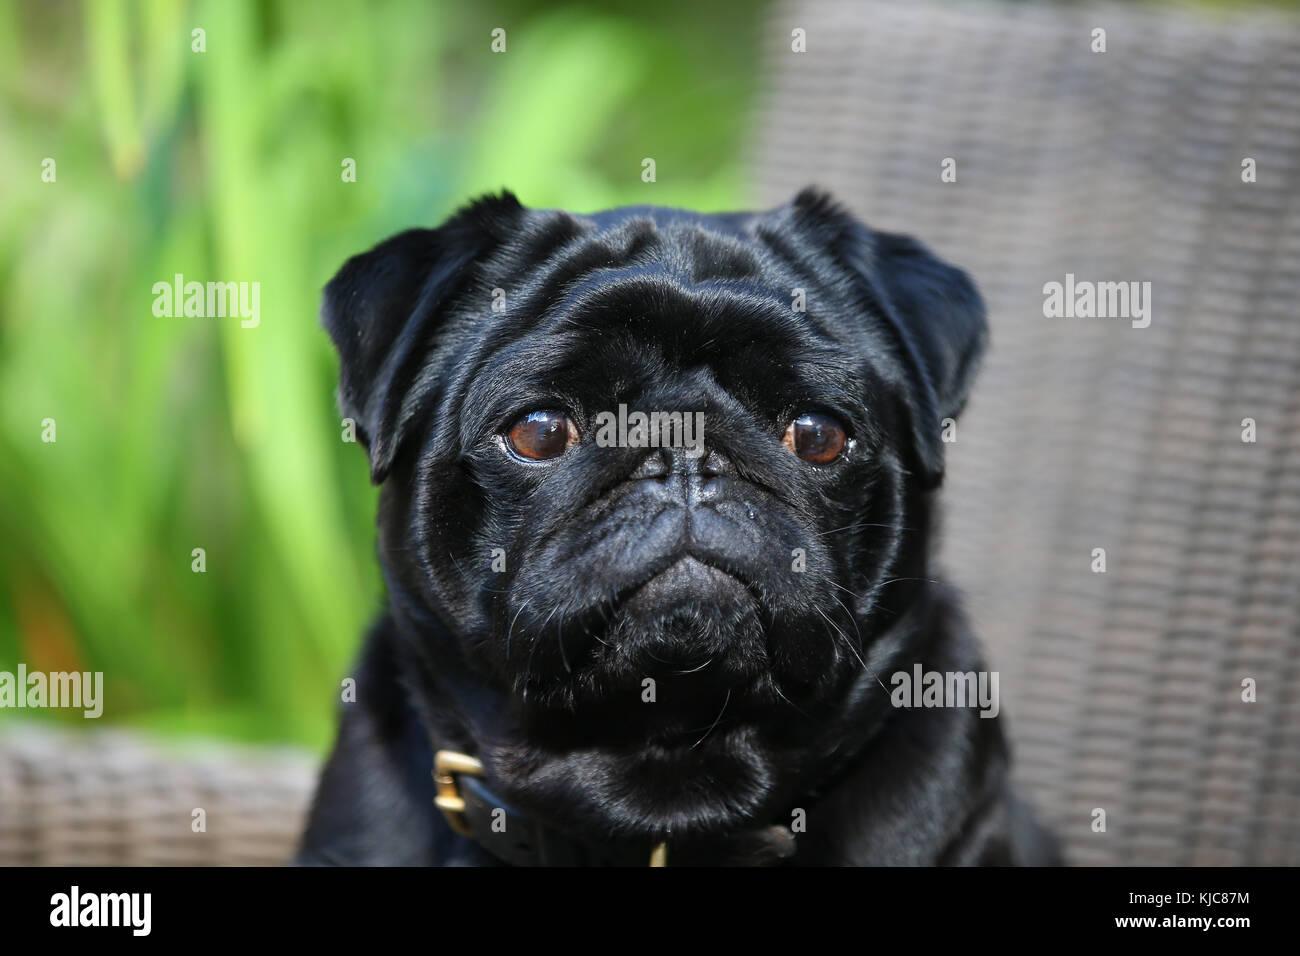 Pug Headshot Alert - Stock Image